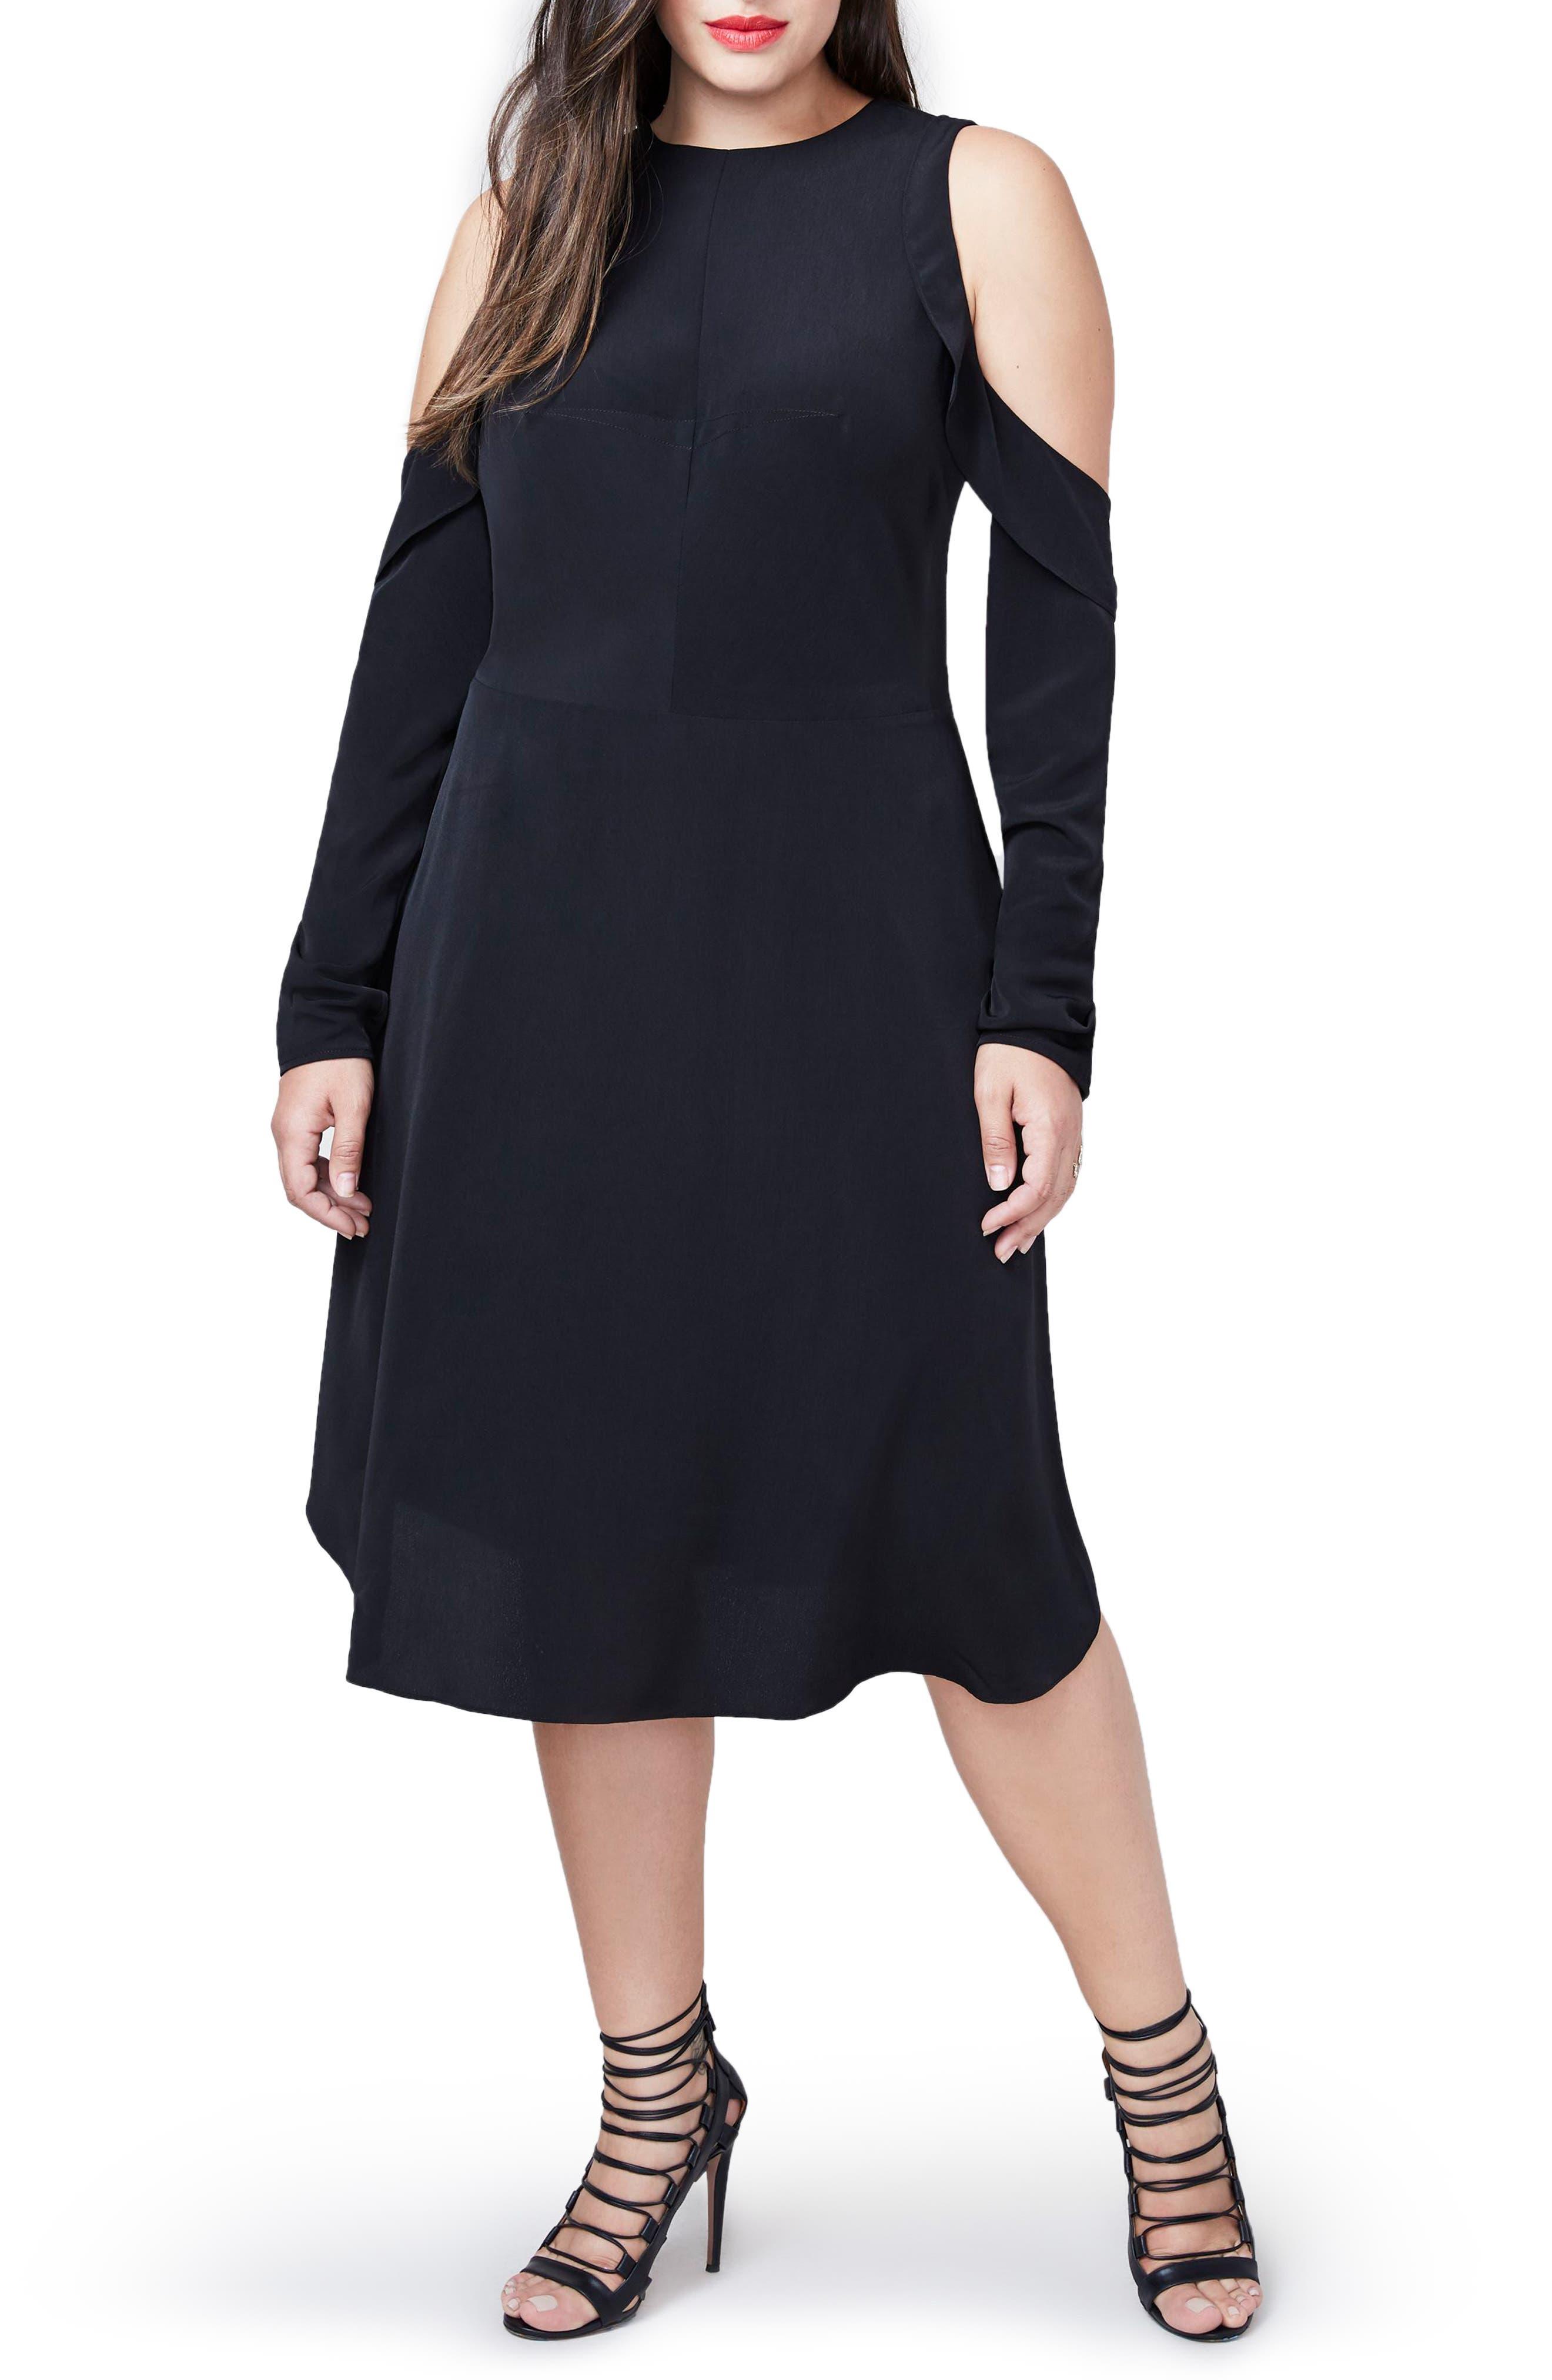 RACHEL Rachel Roy Ruffle Cold Shoulder Dress,                             Main thumbnail 1, color,                             001